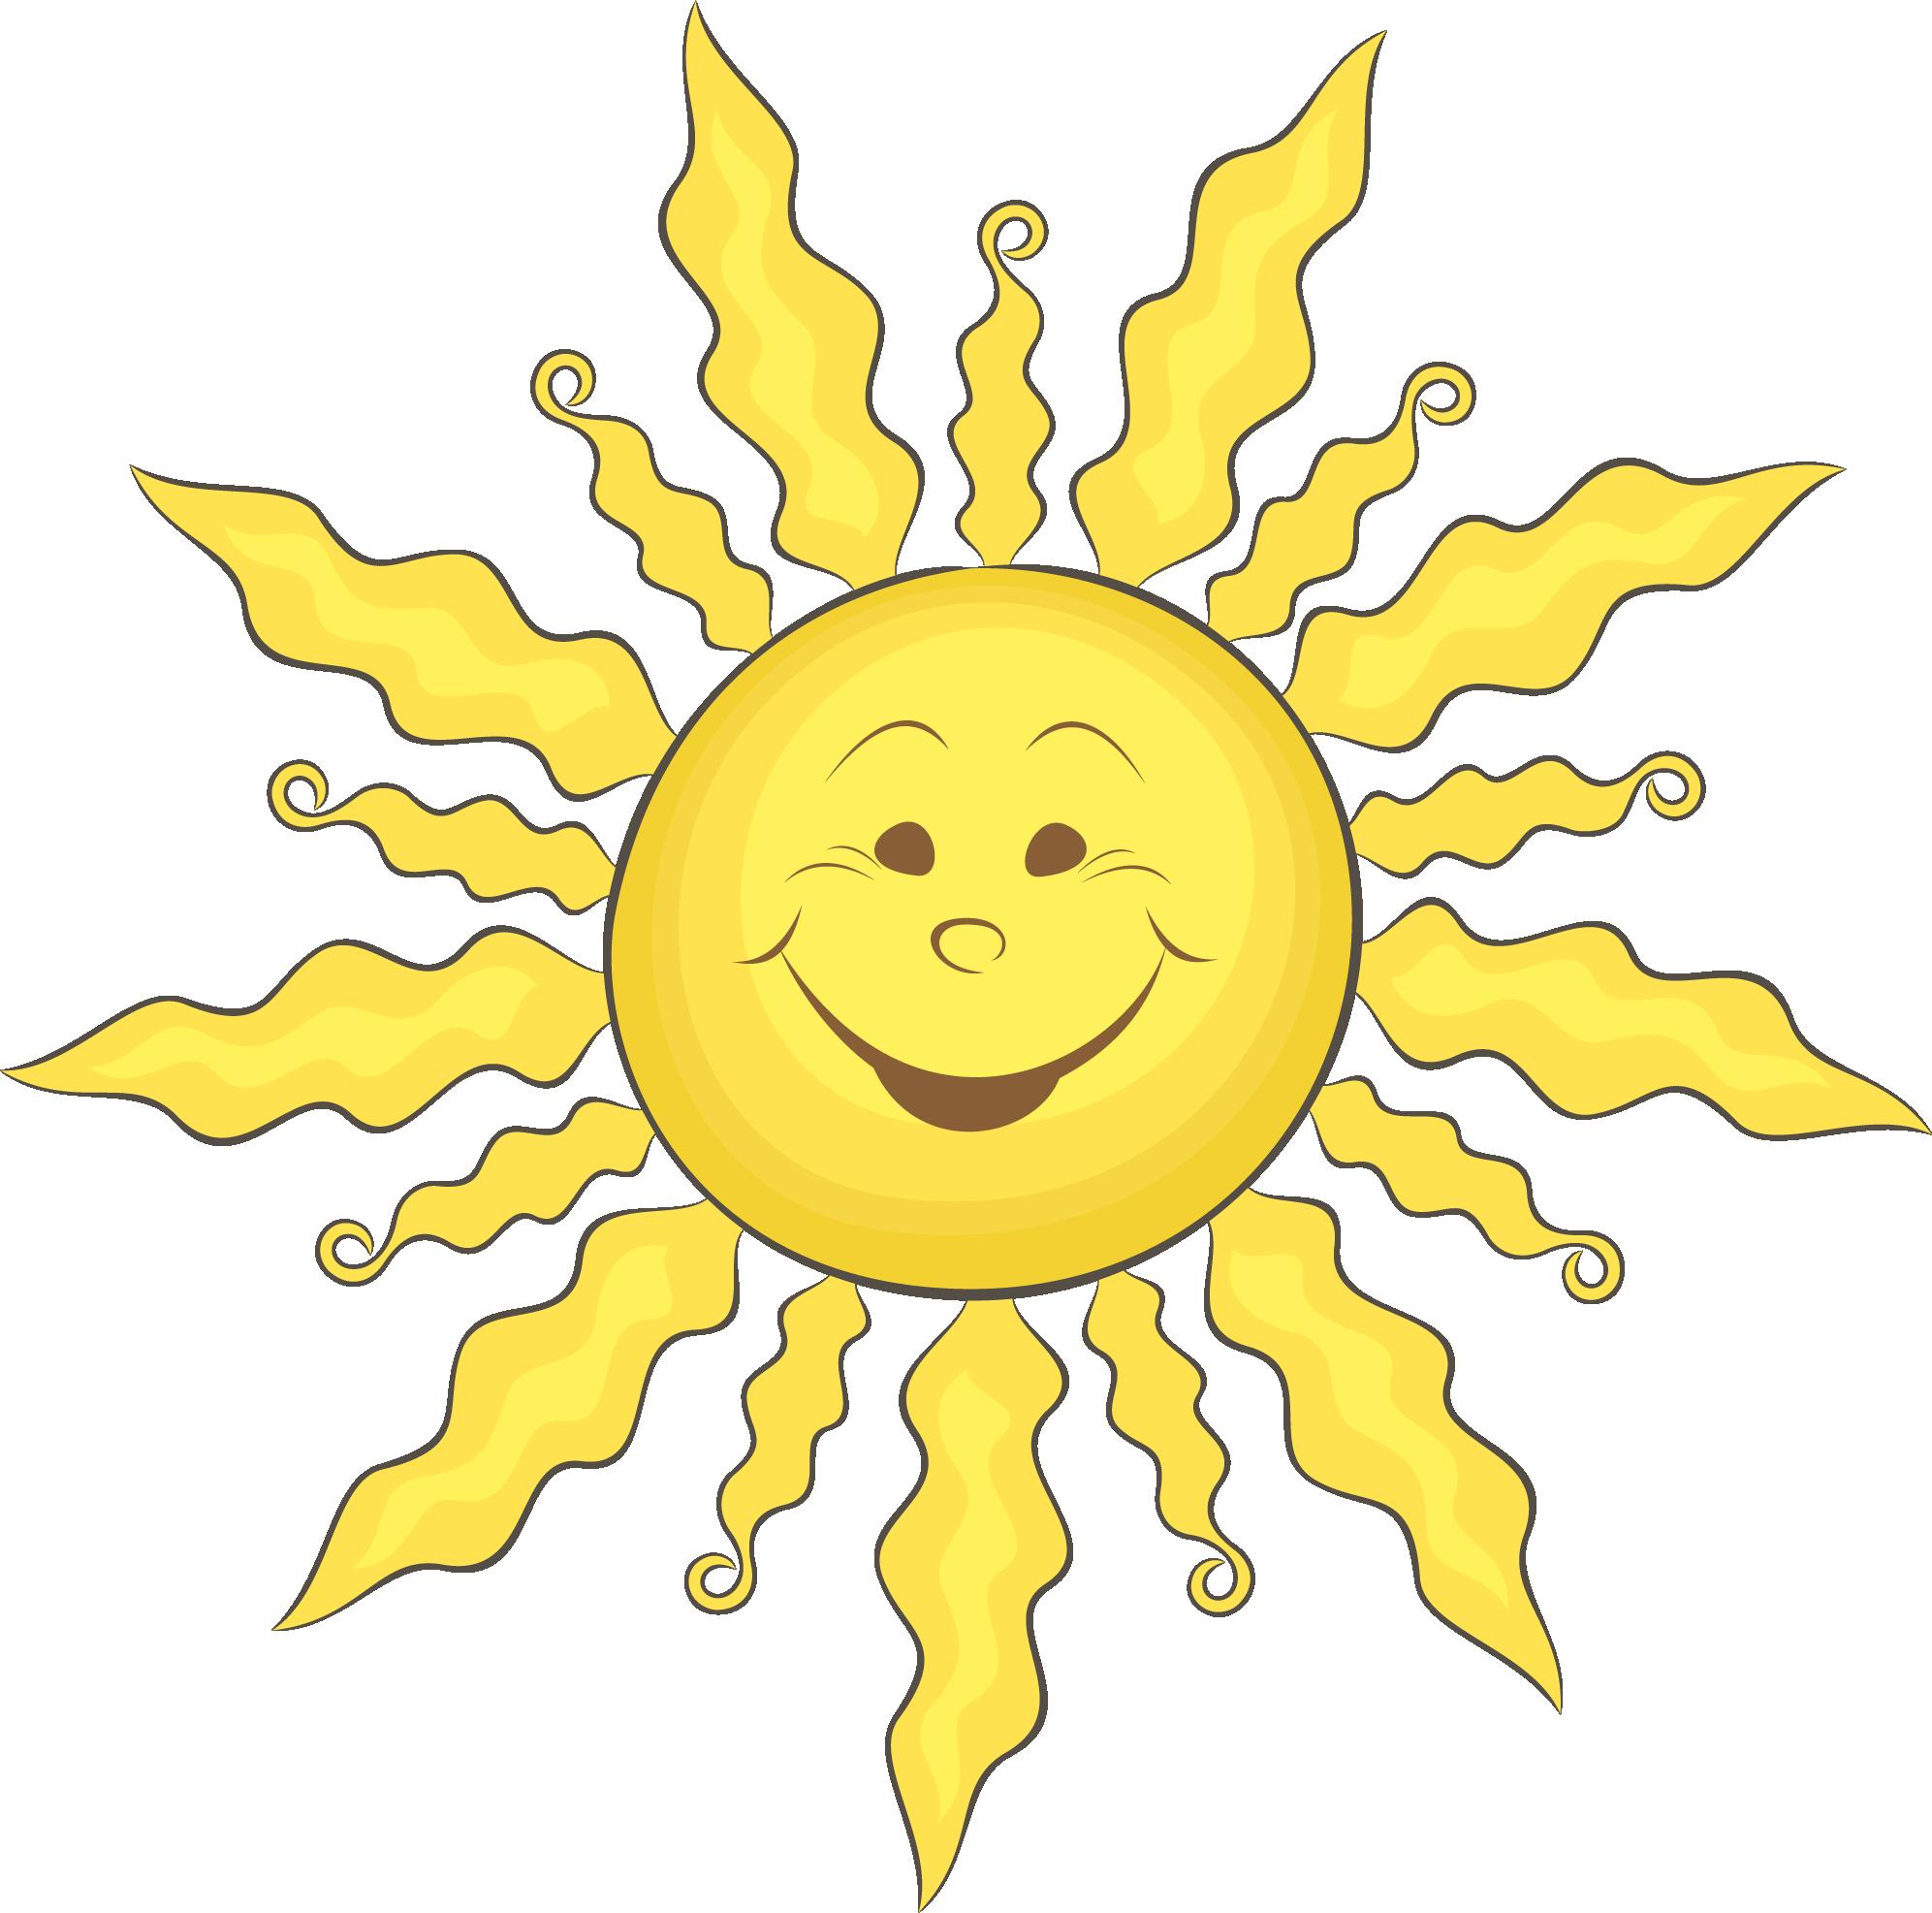 Jpg sun clipart for illustrator vector freeuse stock Cartoon Clip art - Cartoon smiling face sun vector 1993*1973 ... vector freeuse stock